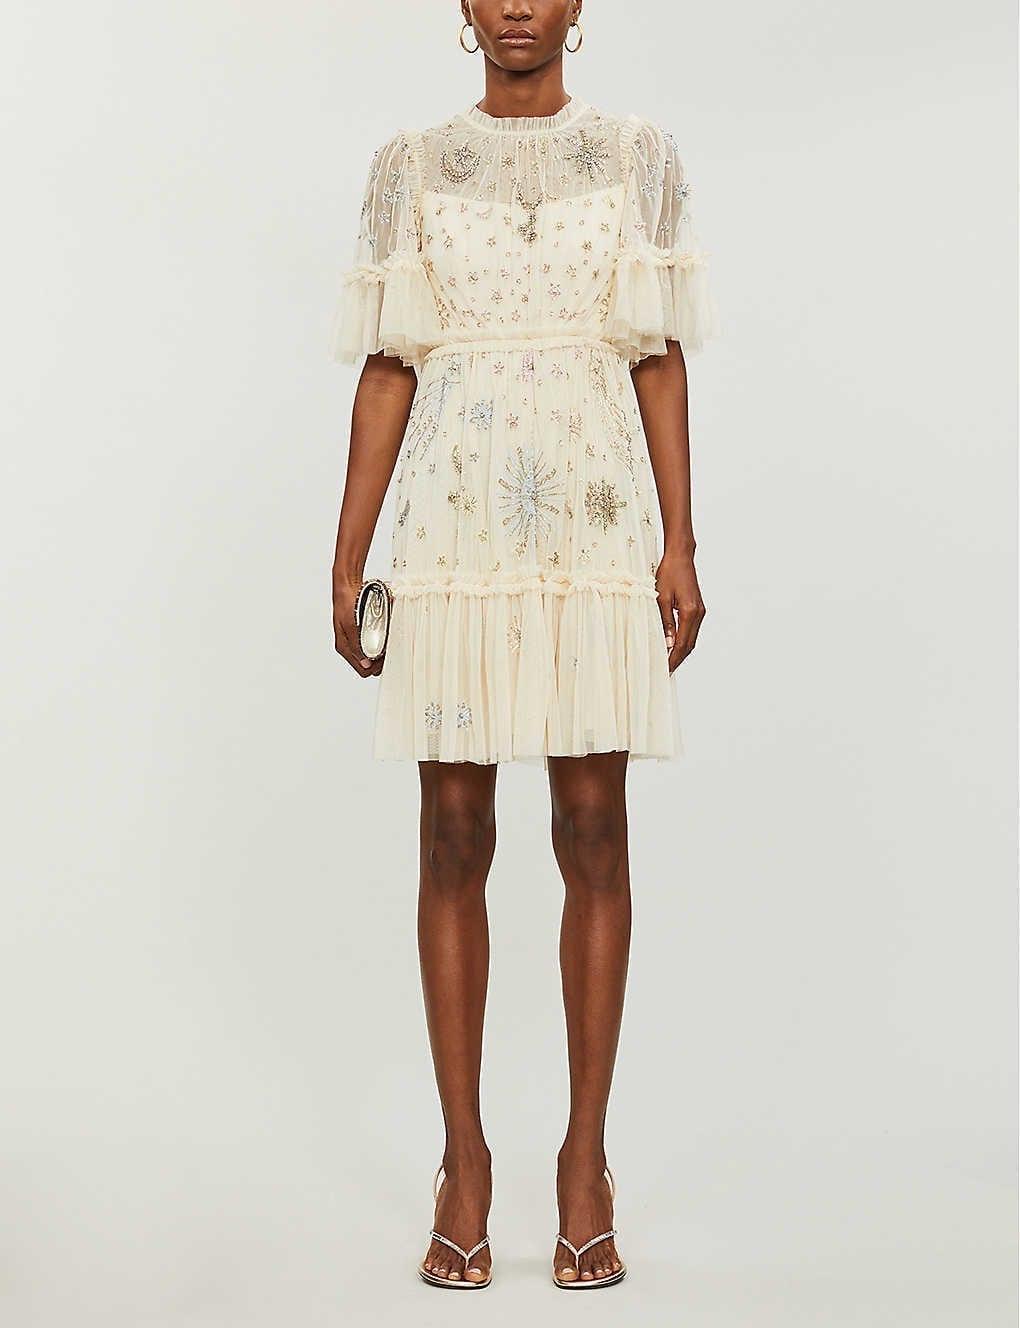 NEEDLE AND THREAD X Jasmine Hemsley Ether Crystal-embellished Recycled-tulle Mini Dress